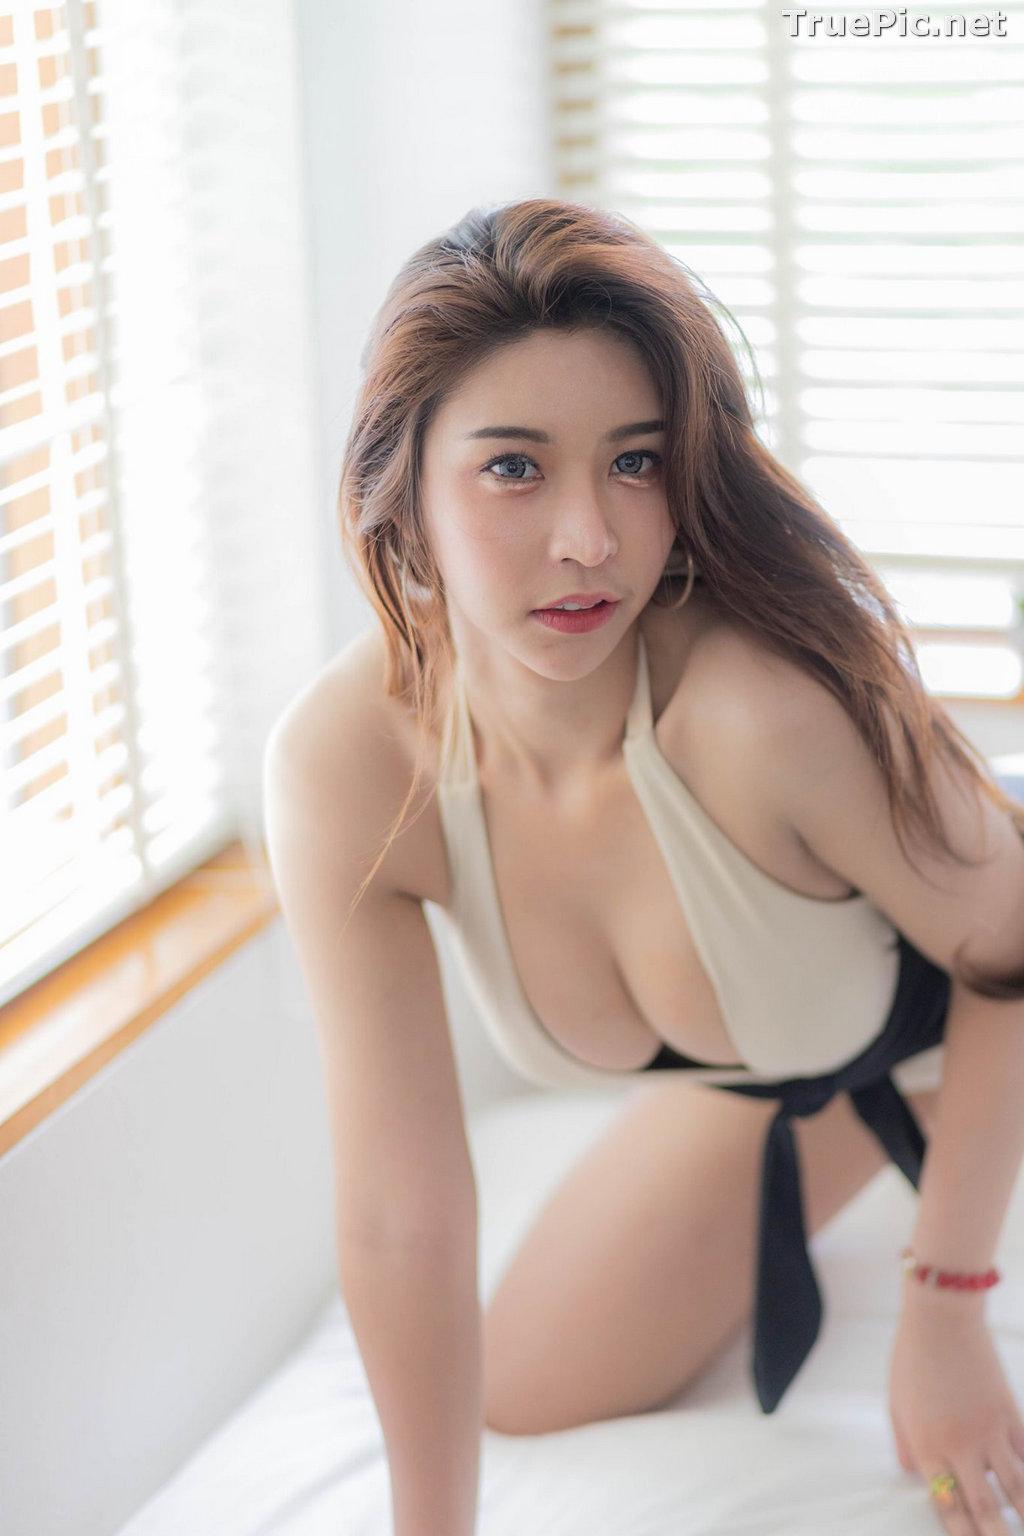 Image Thailand Model - Palm Palmvilai Raksapon - Let's Swimming With Me - TruePic.net - Picture-6